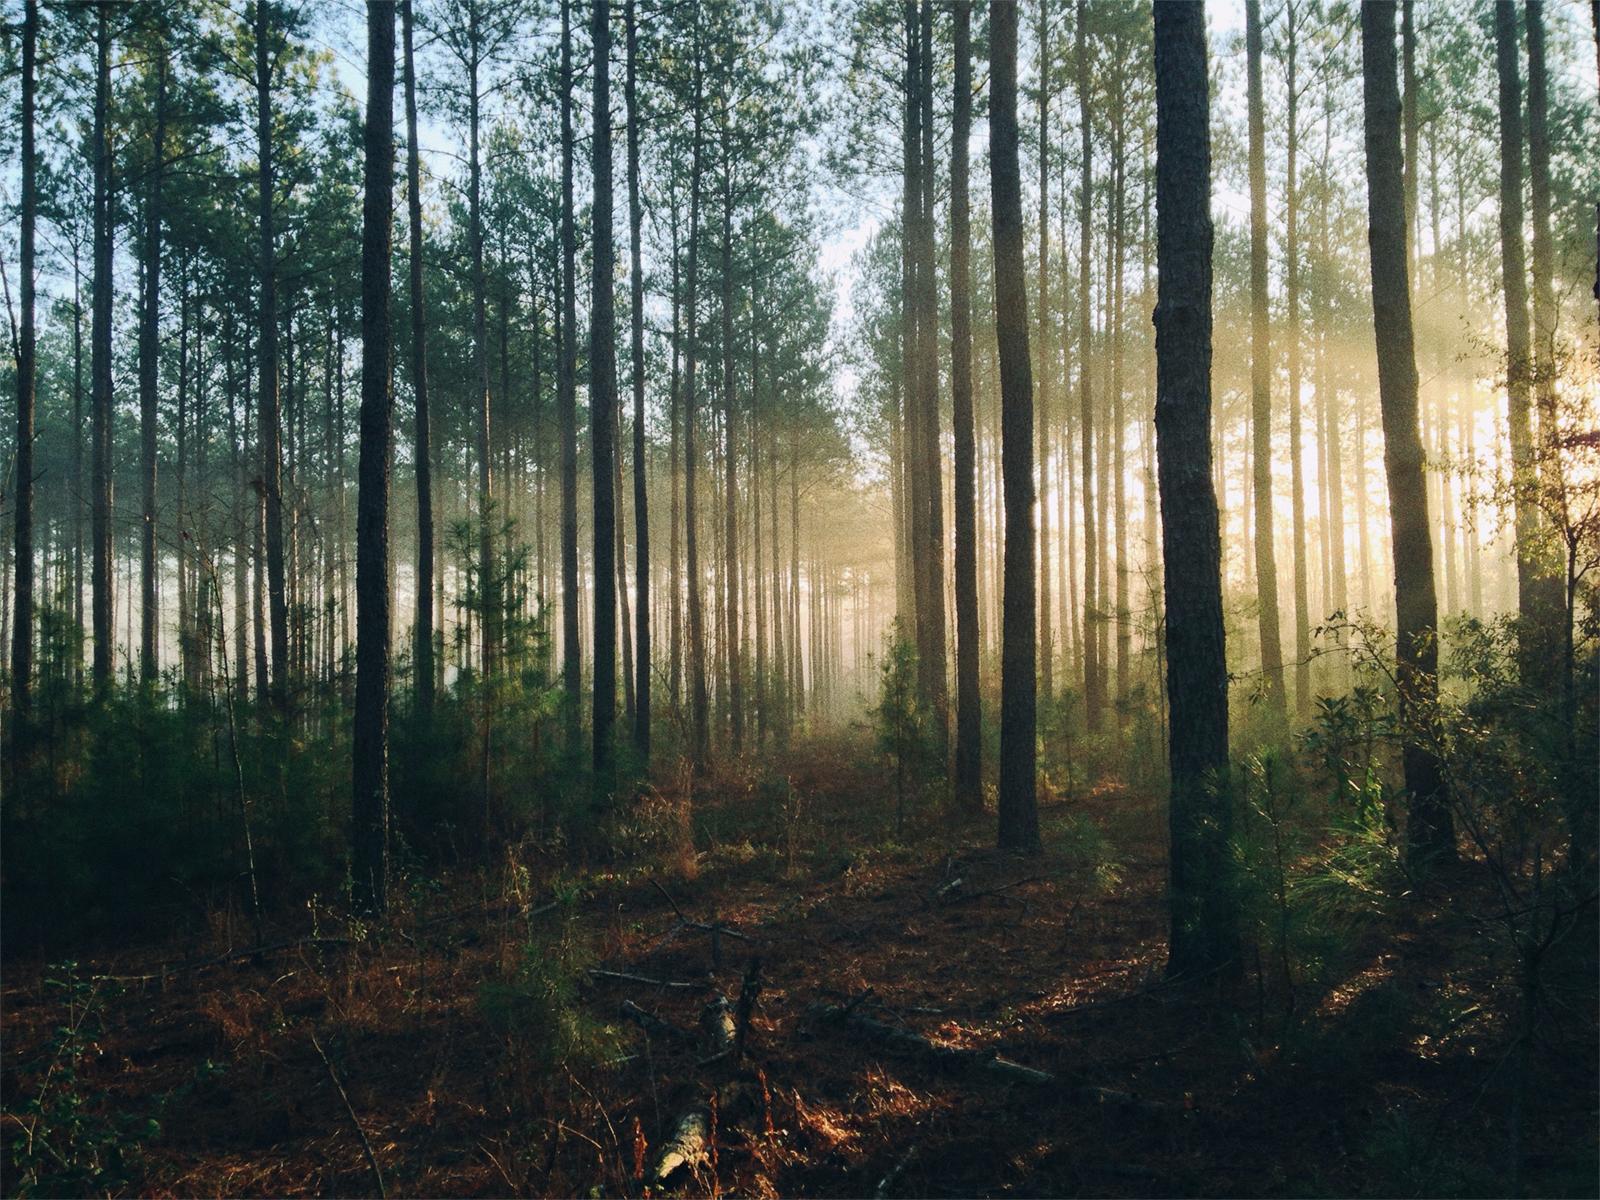 Sun rays through forest trees